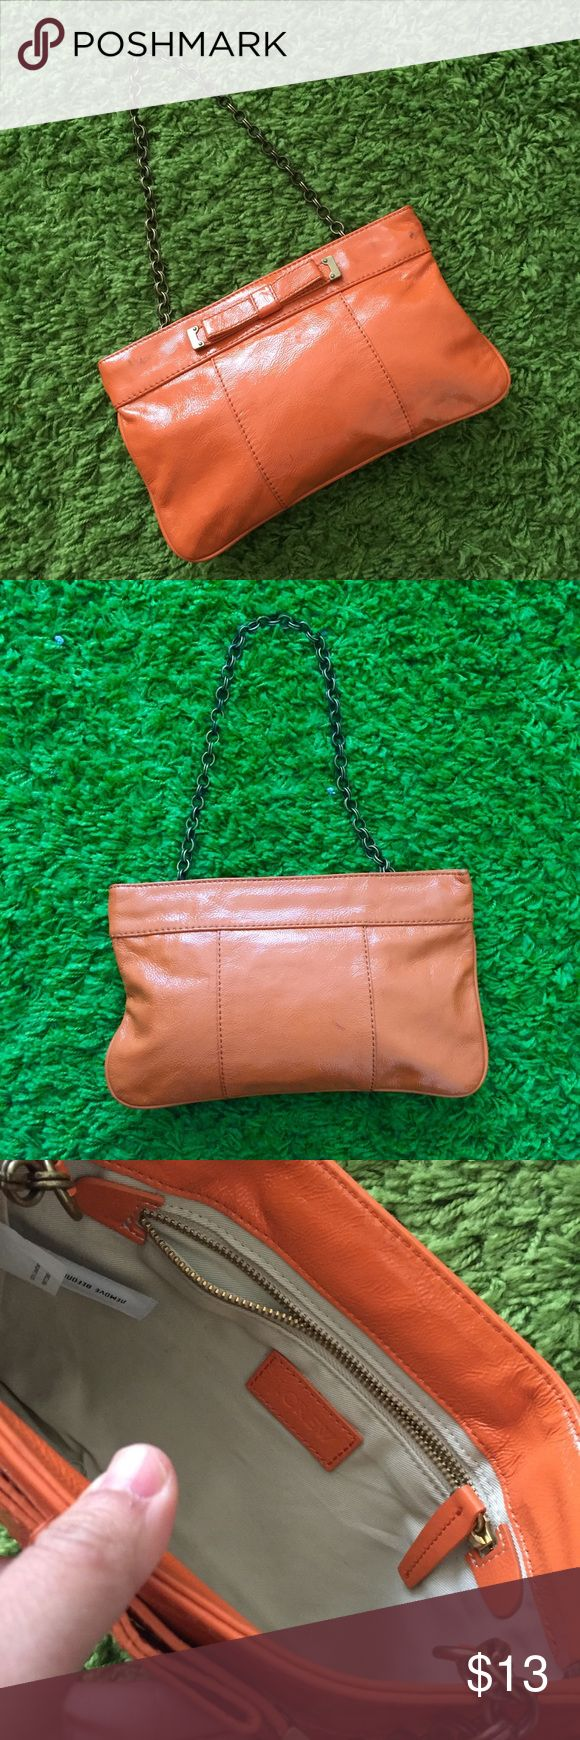 J. Crew orange Shoulder bag / clutch J. Crew orange Shoulder bag / clutch J. Crew Bags Clutches & Wristlets